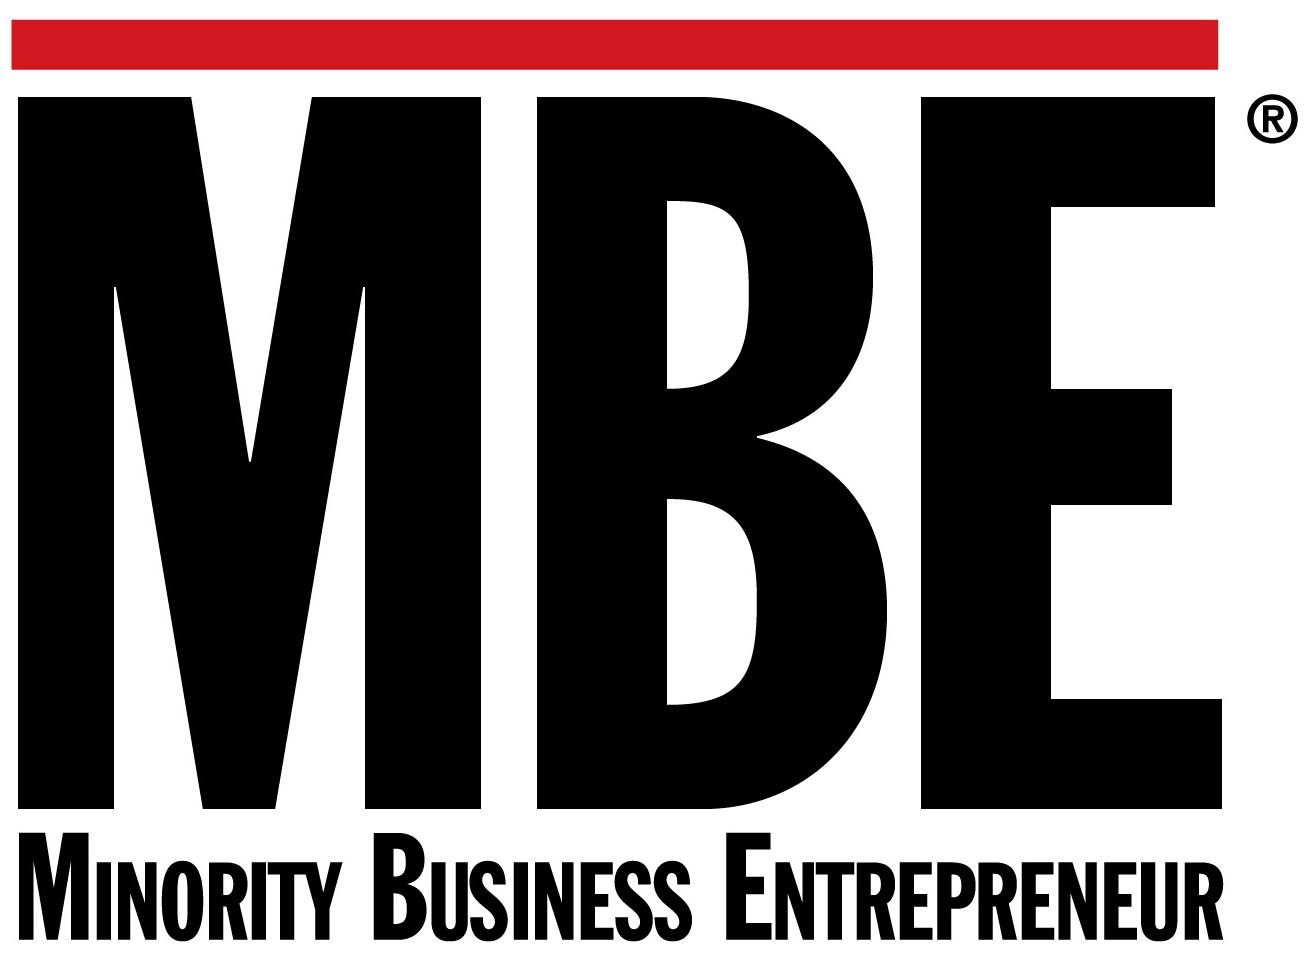 MBE logo 2012 red bar Hi Res.jpg